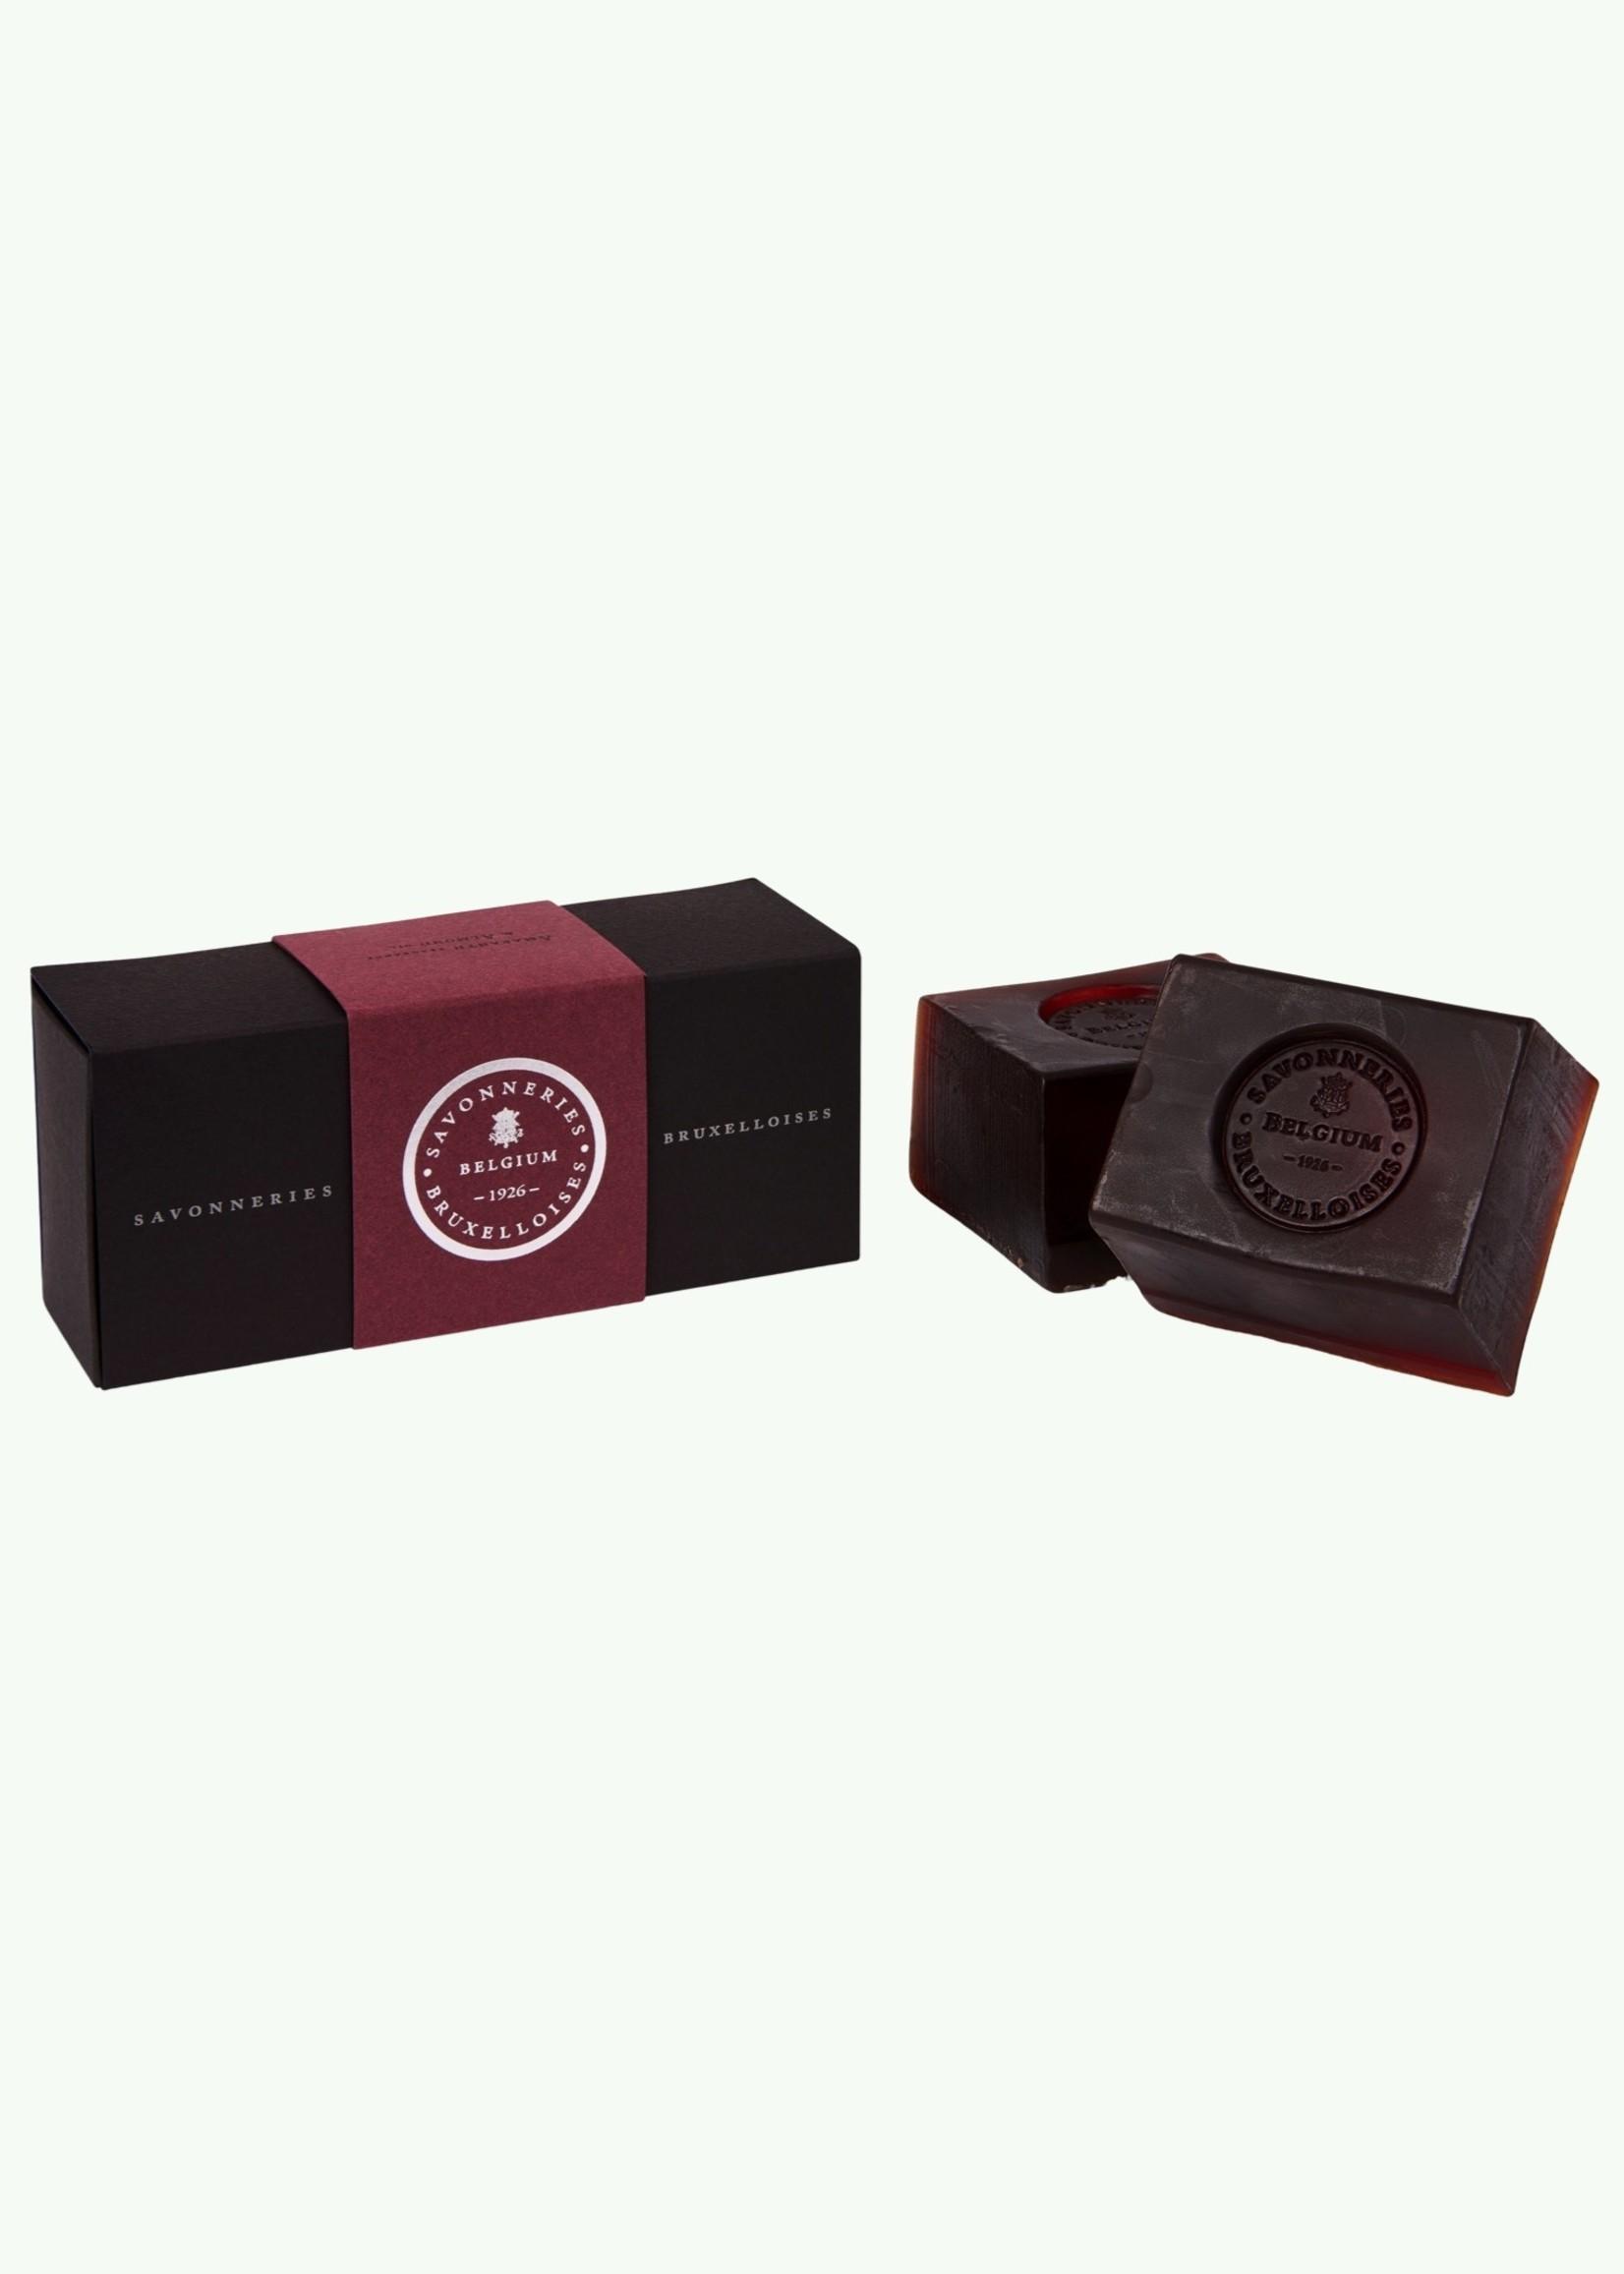 Savonneries Bruxelloises Savonneries Bruxelloises - Amaranth & Almond Oil - Soap - 2 x 200 gr